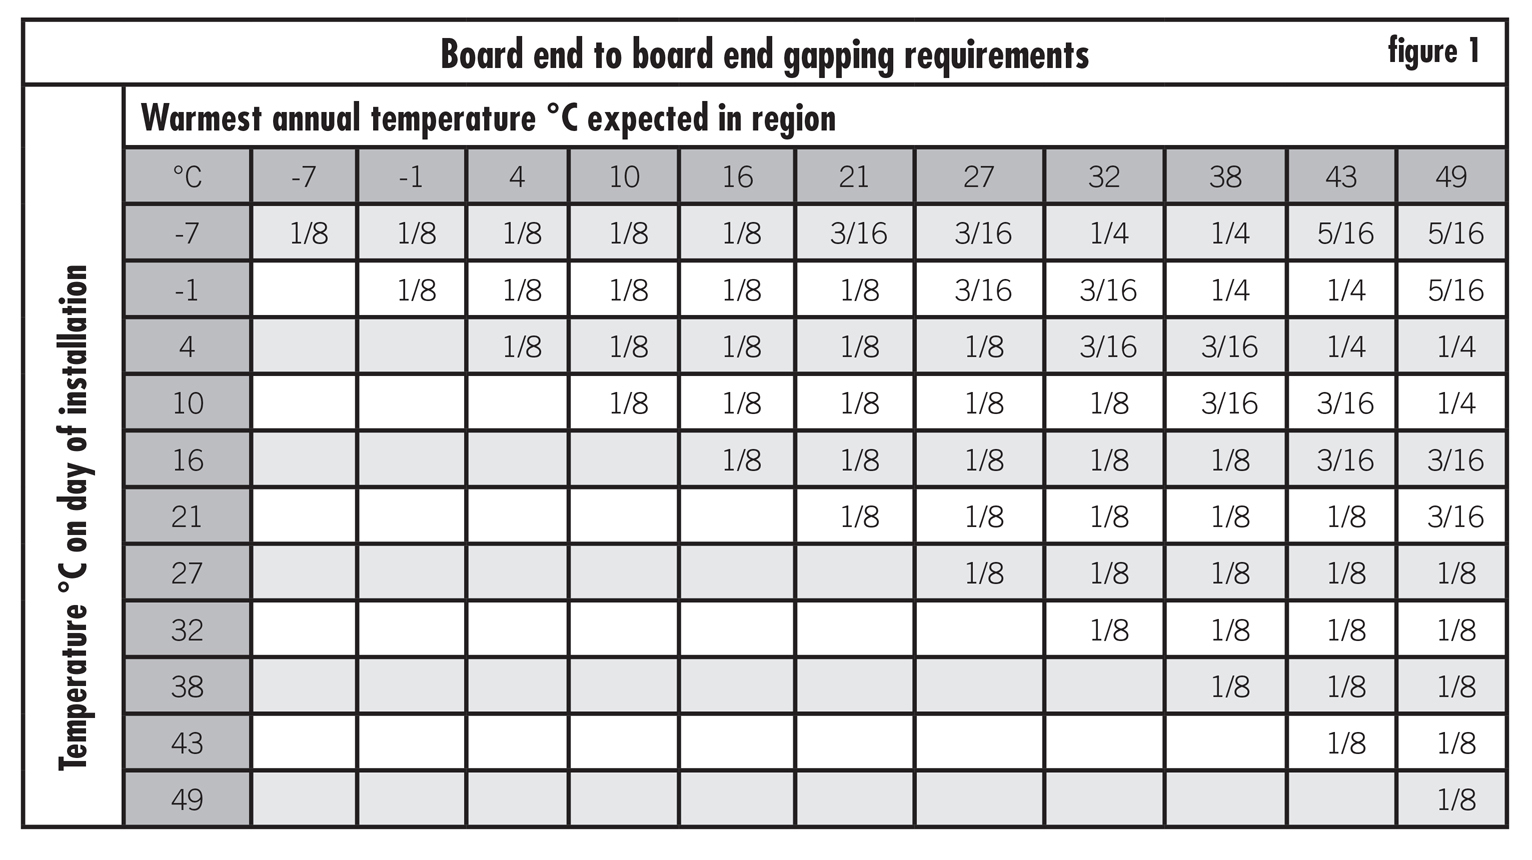 Joist Spacing For 2x6 Deck Boards Decks Ideas